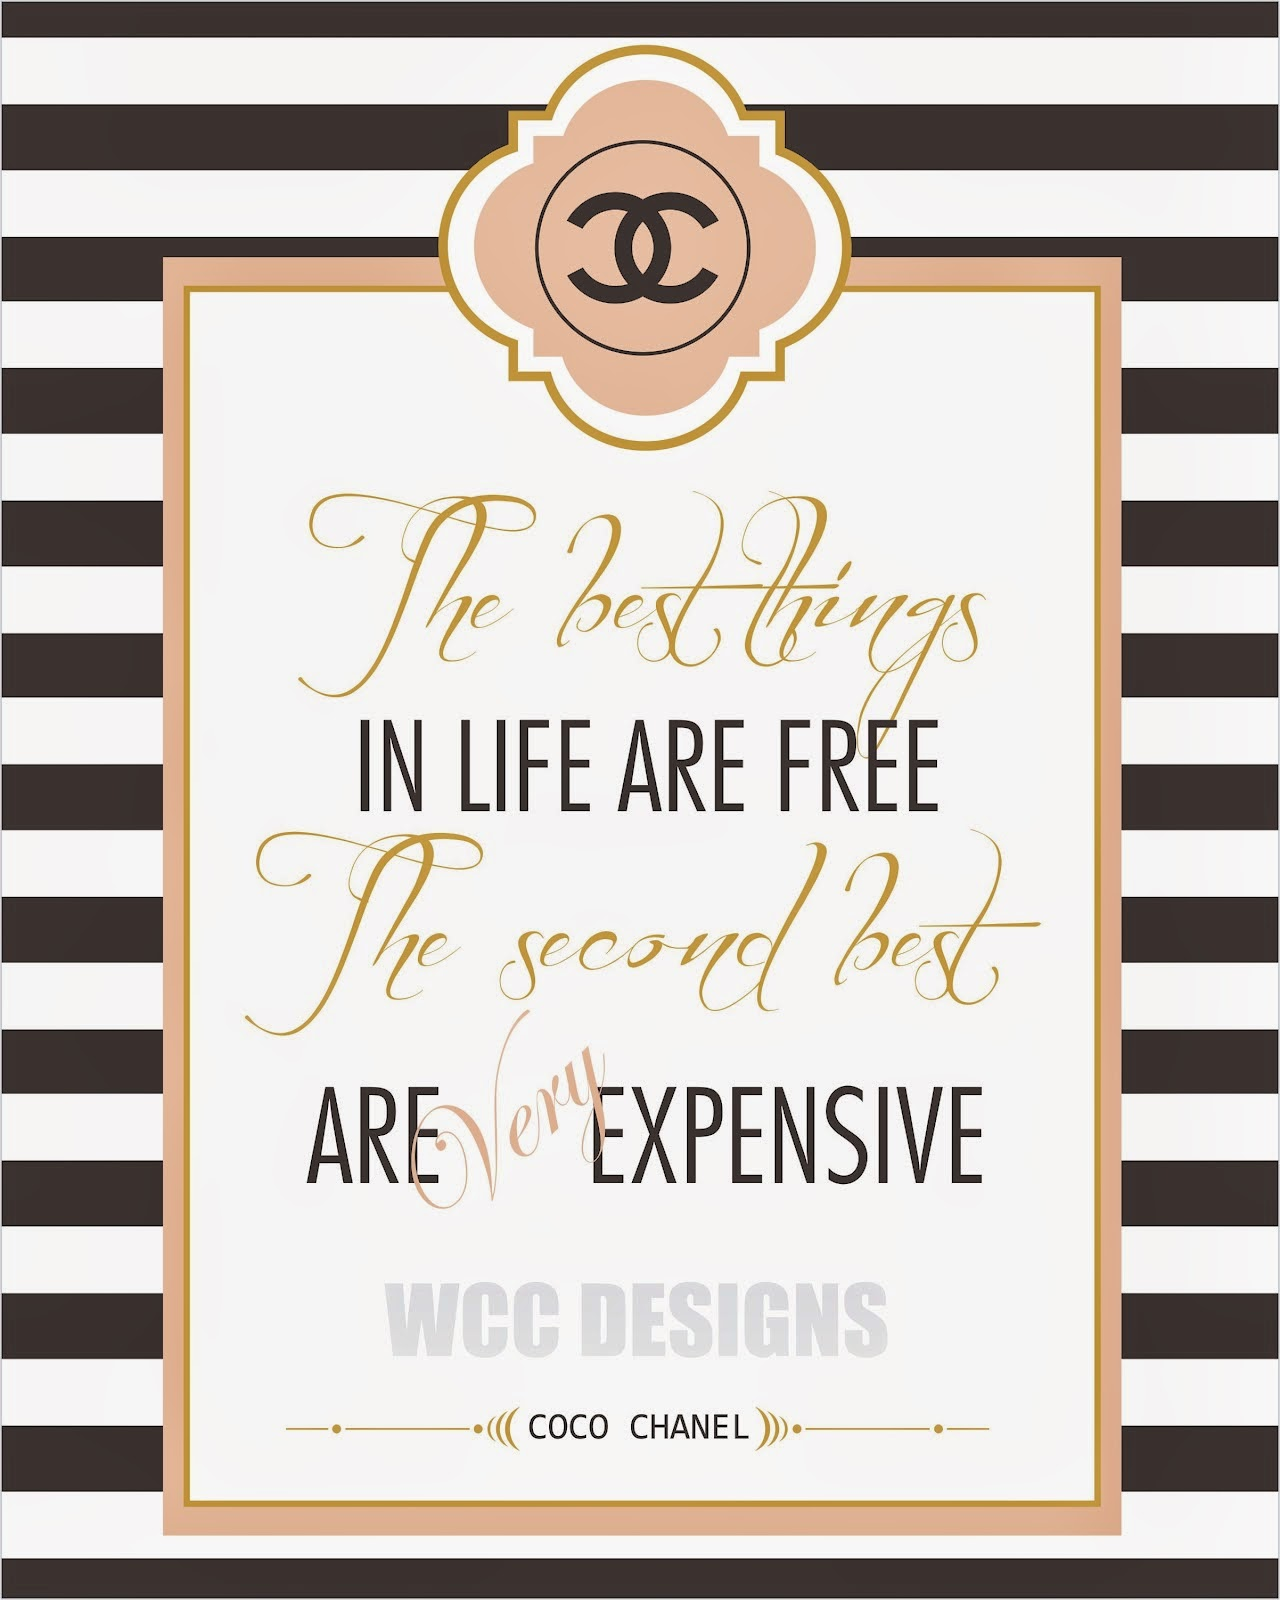 Kit de Chanel para Imprimir Gratis. | Ideas y material gratis para ...